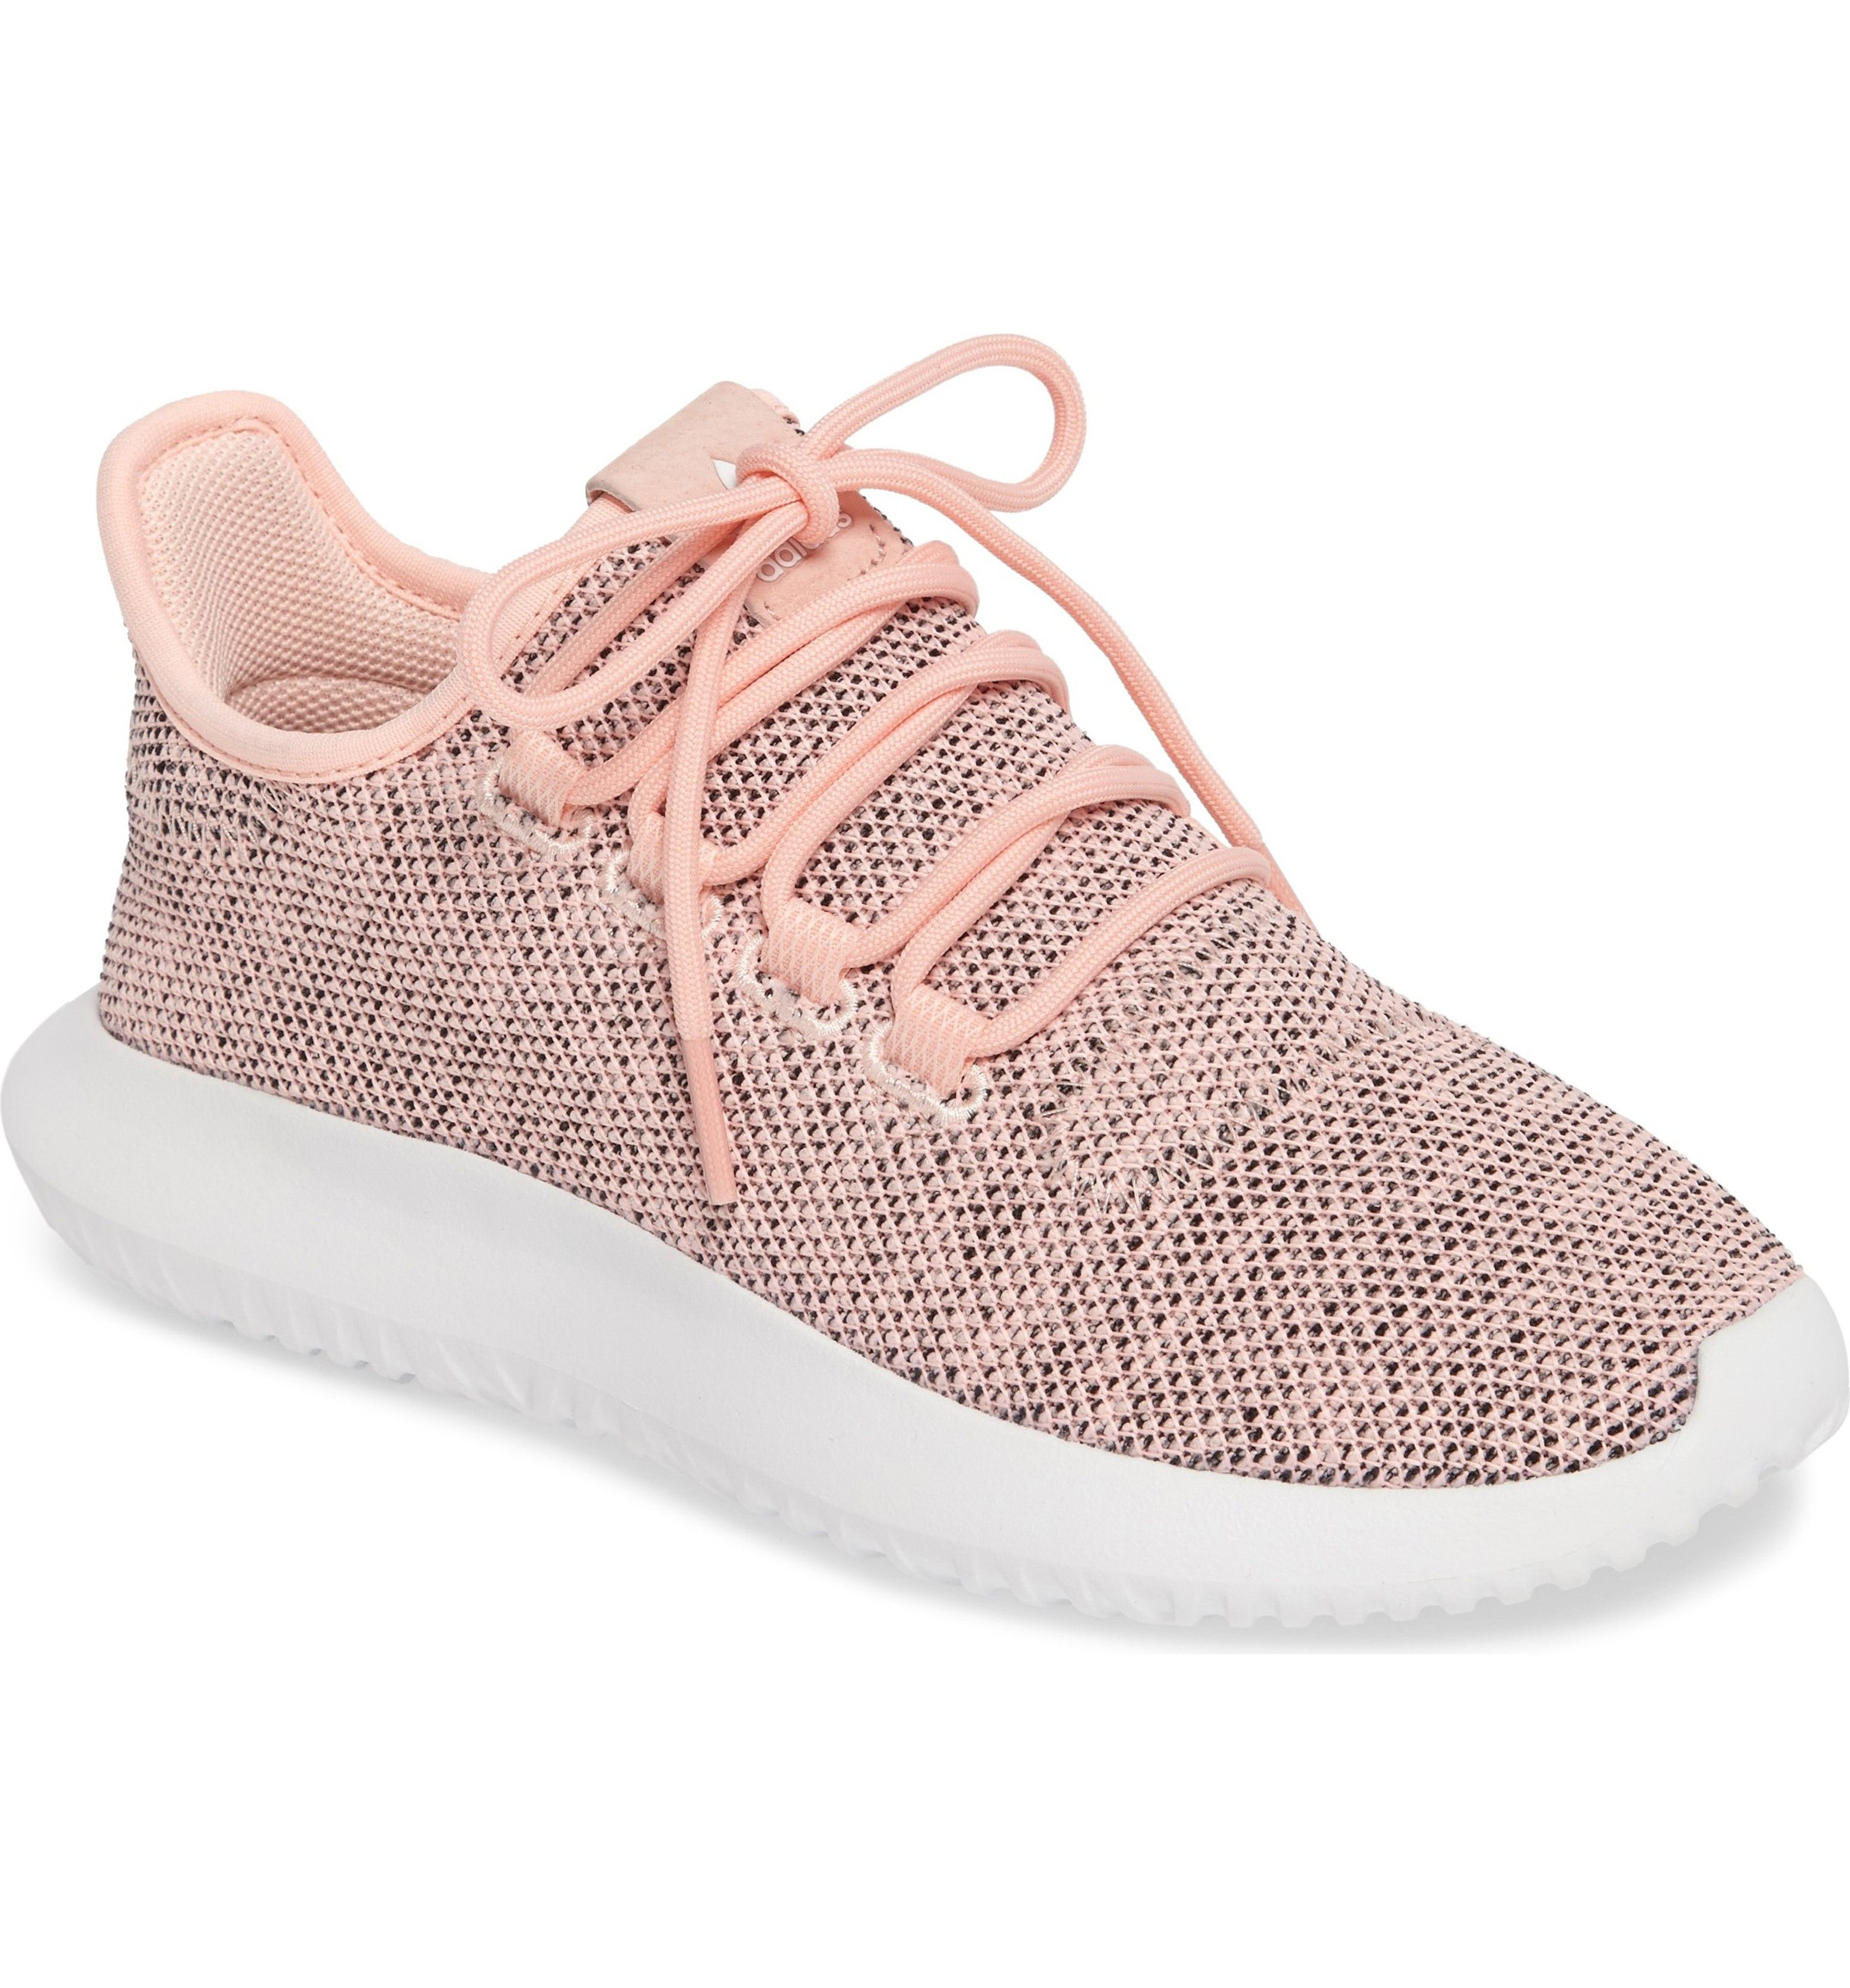 immagine principale di scarpe da ginnastica adidas tubulare ombra (donne) m i n e